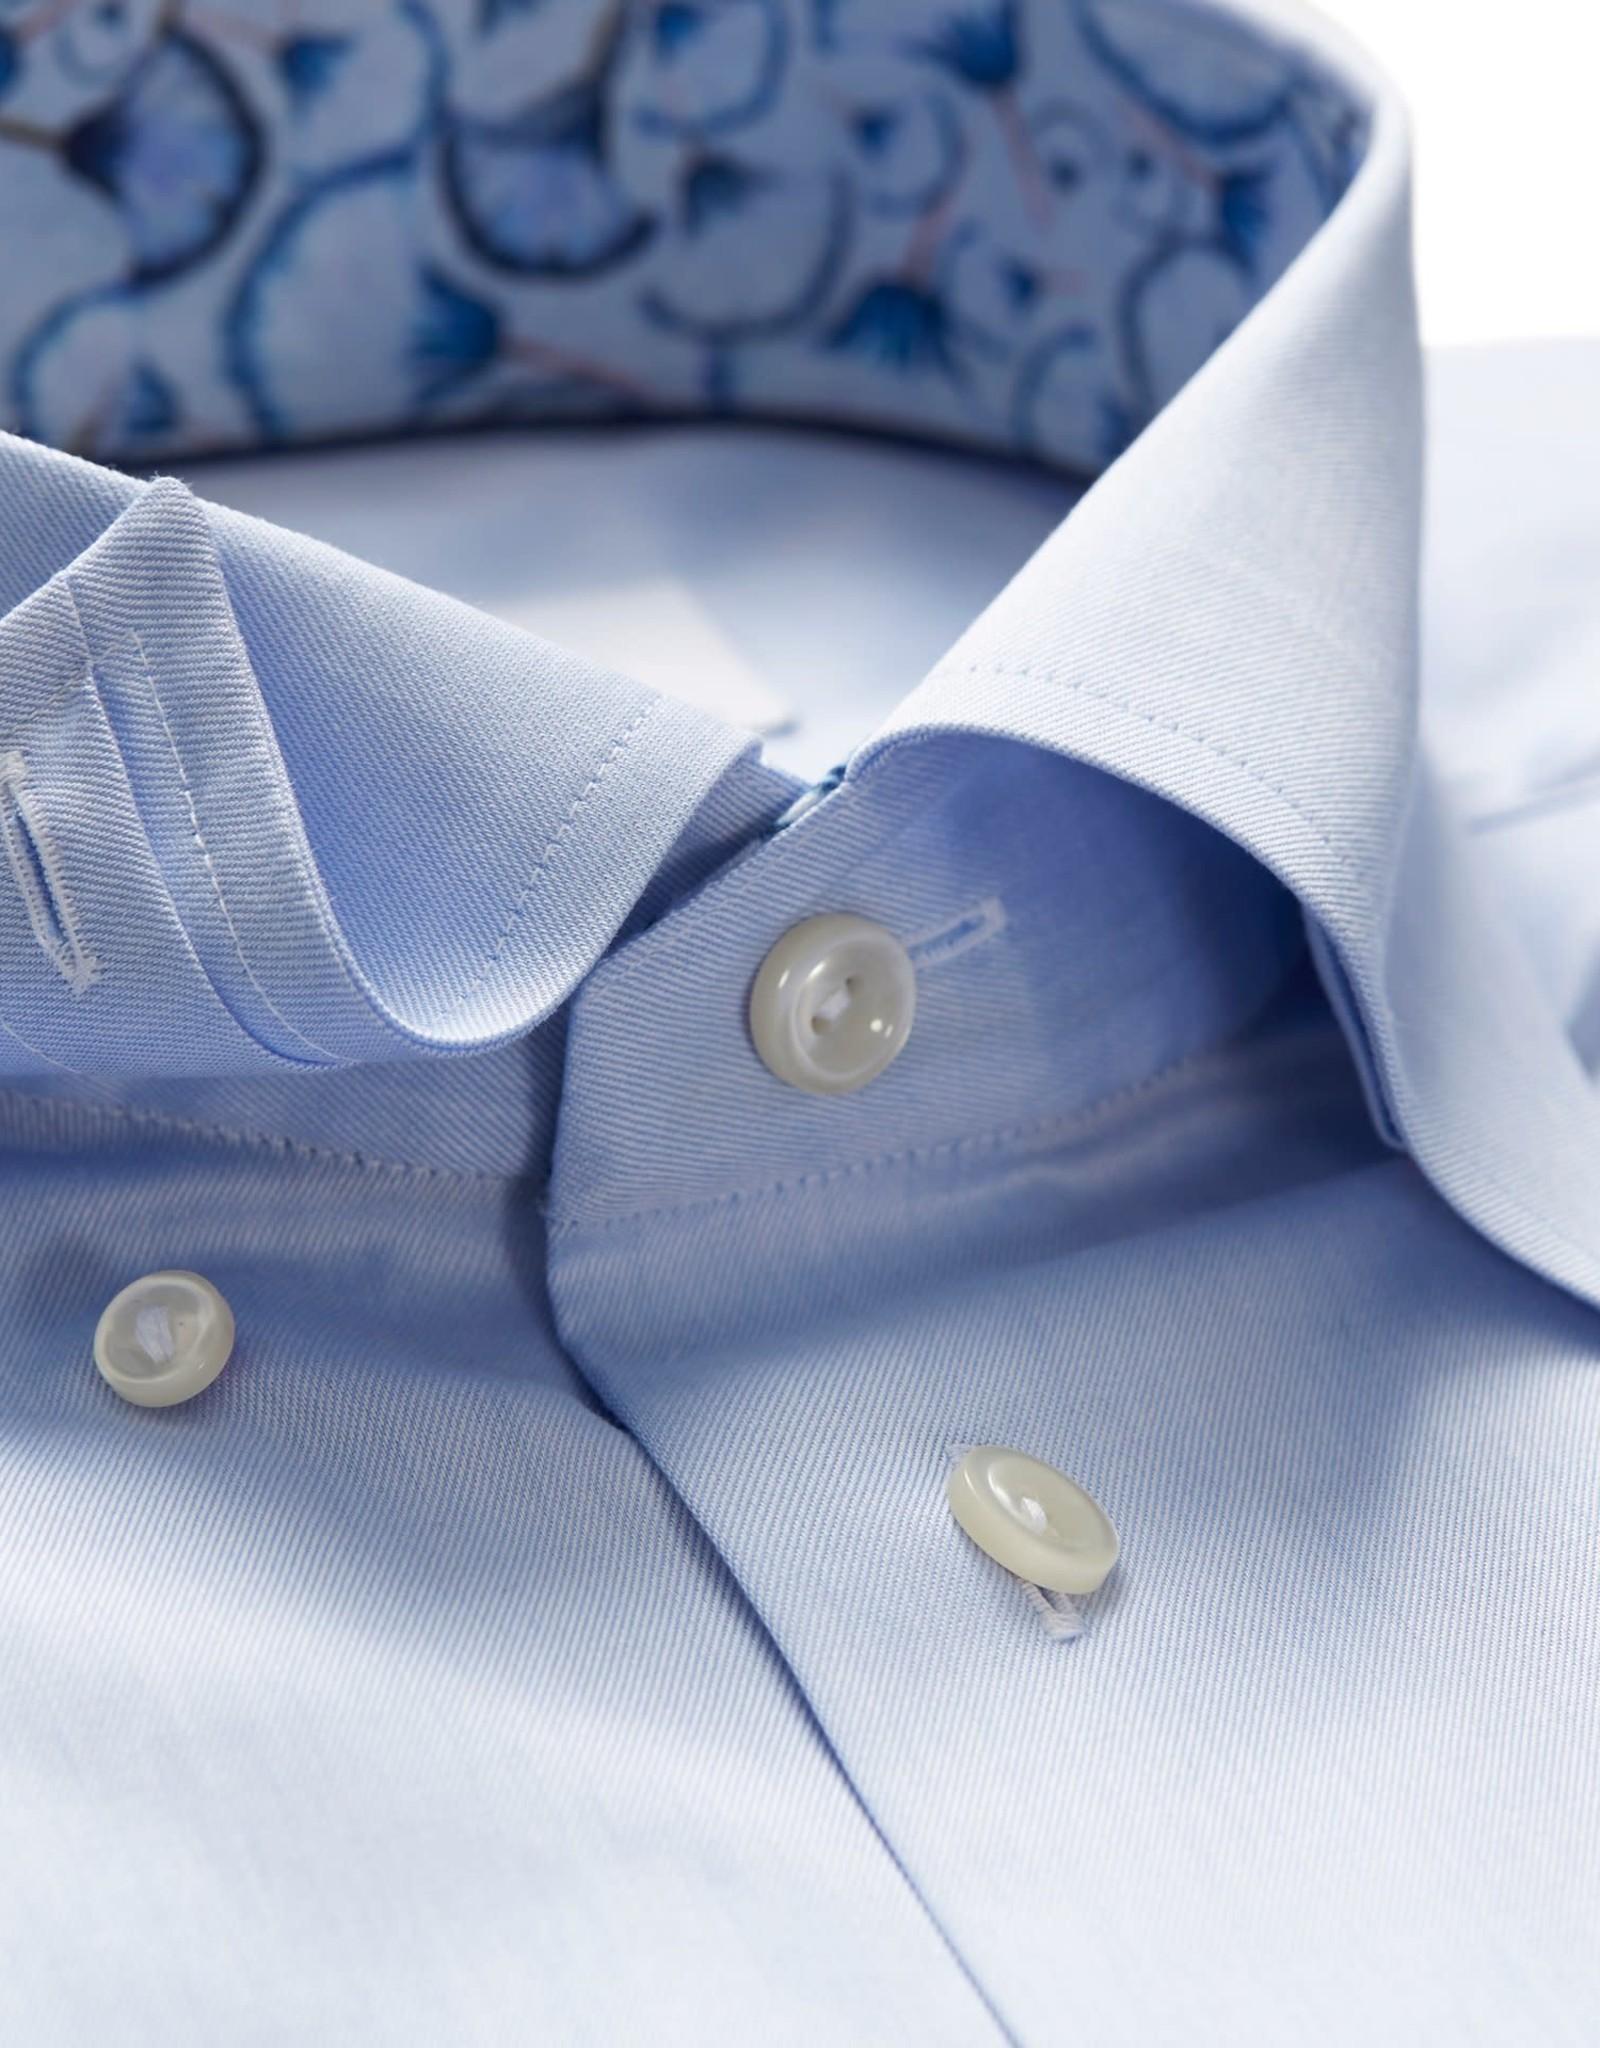 Eton Eton hemd blauw slim 57